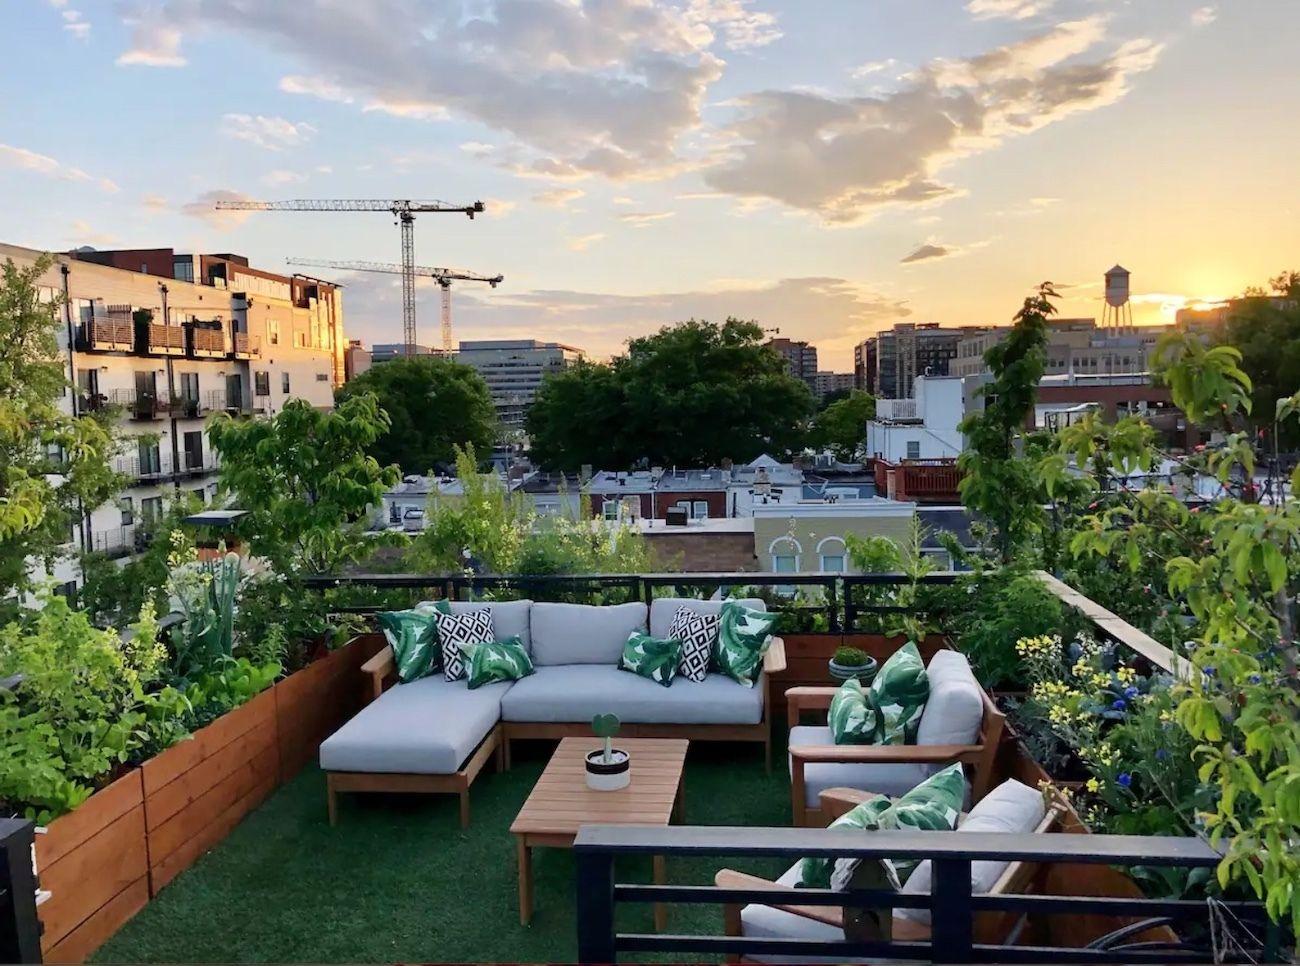 Union-Market-penthouse-apartment-with-epic-view-Washington-DC-Airbnb, Washington, DC Airbnbs